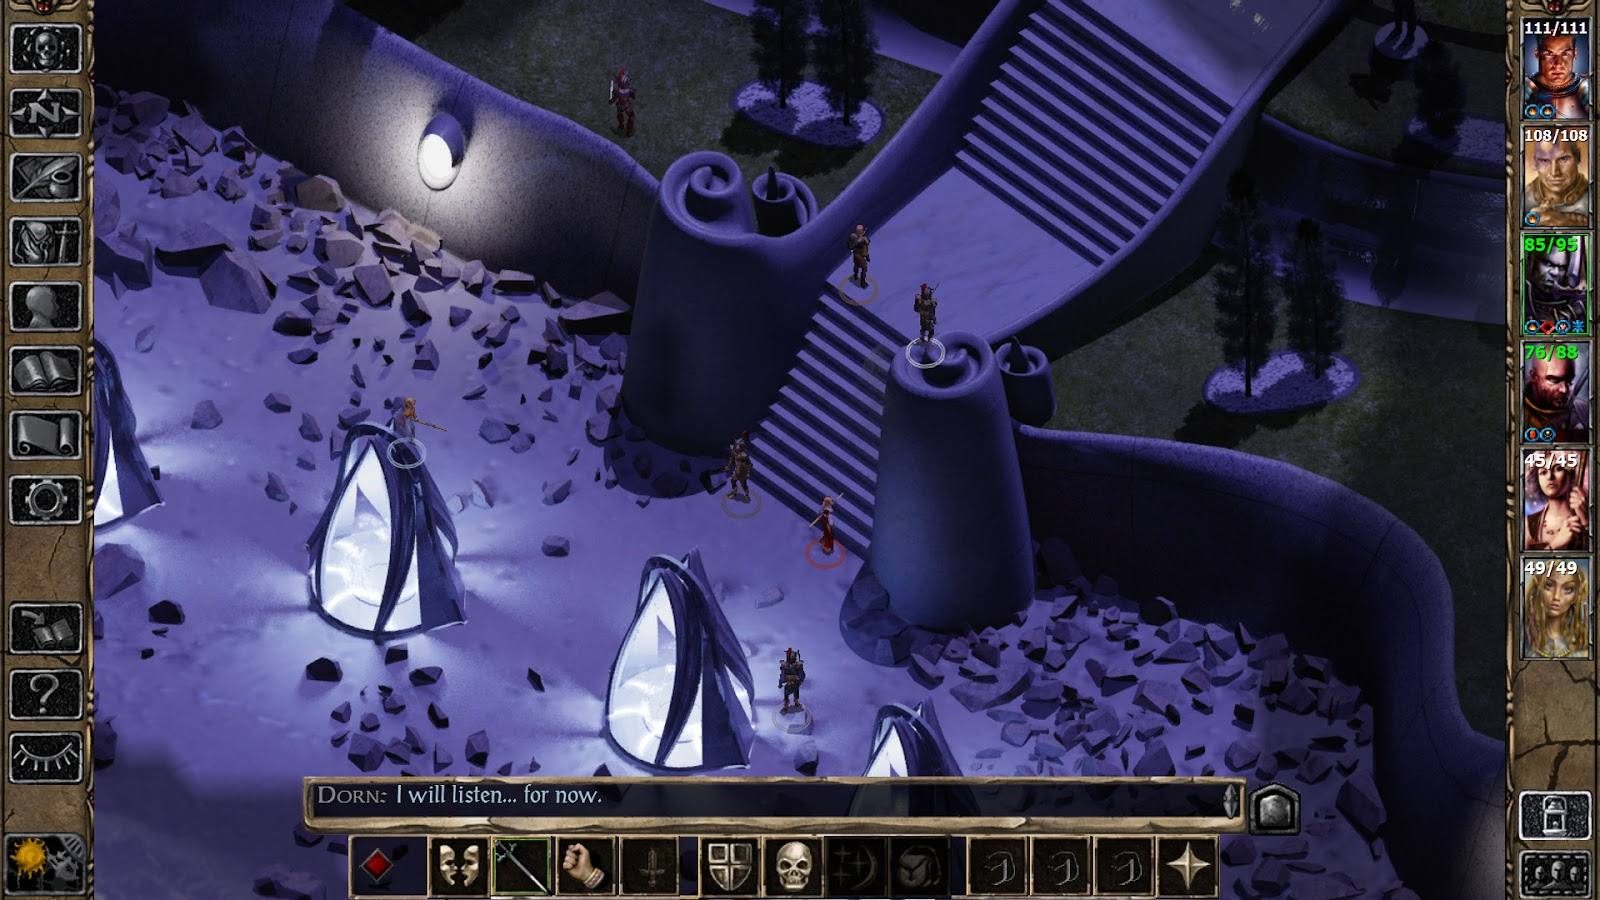 Baldurs Gate Ii Enhanced Edition Full Español Mega